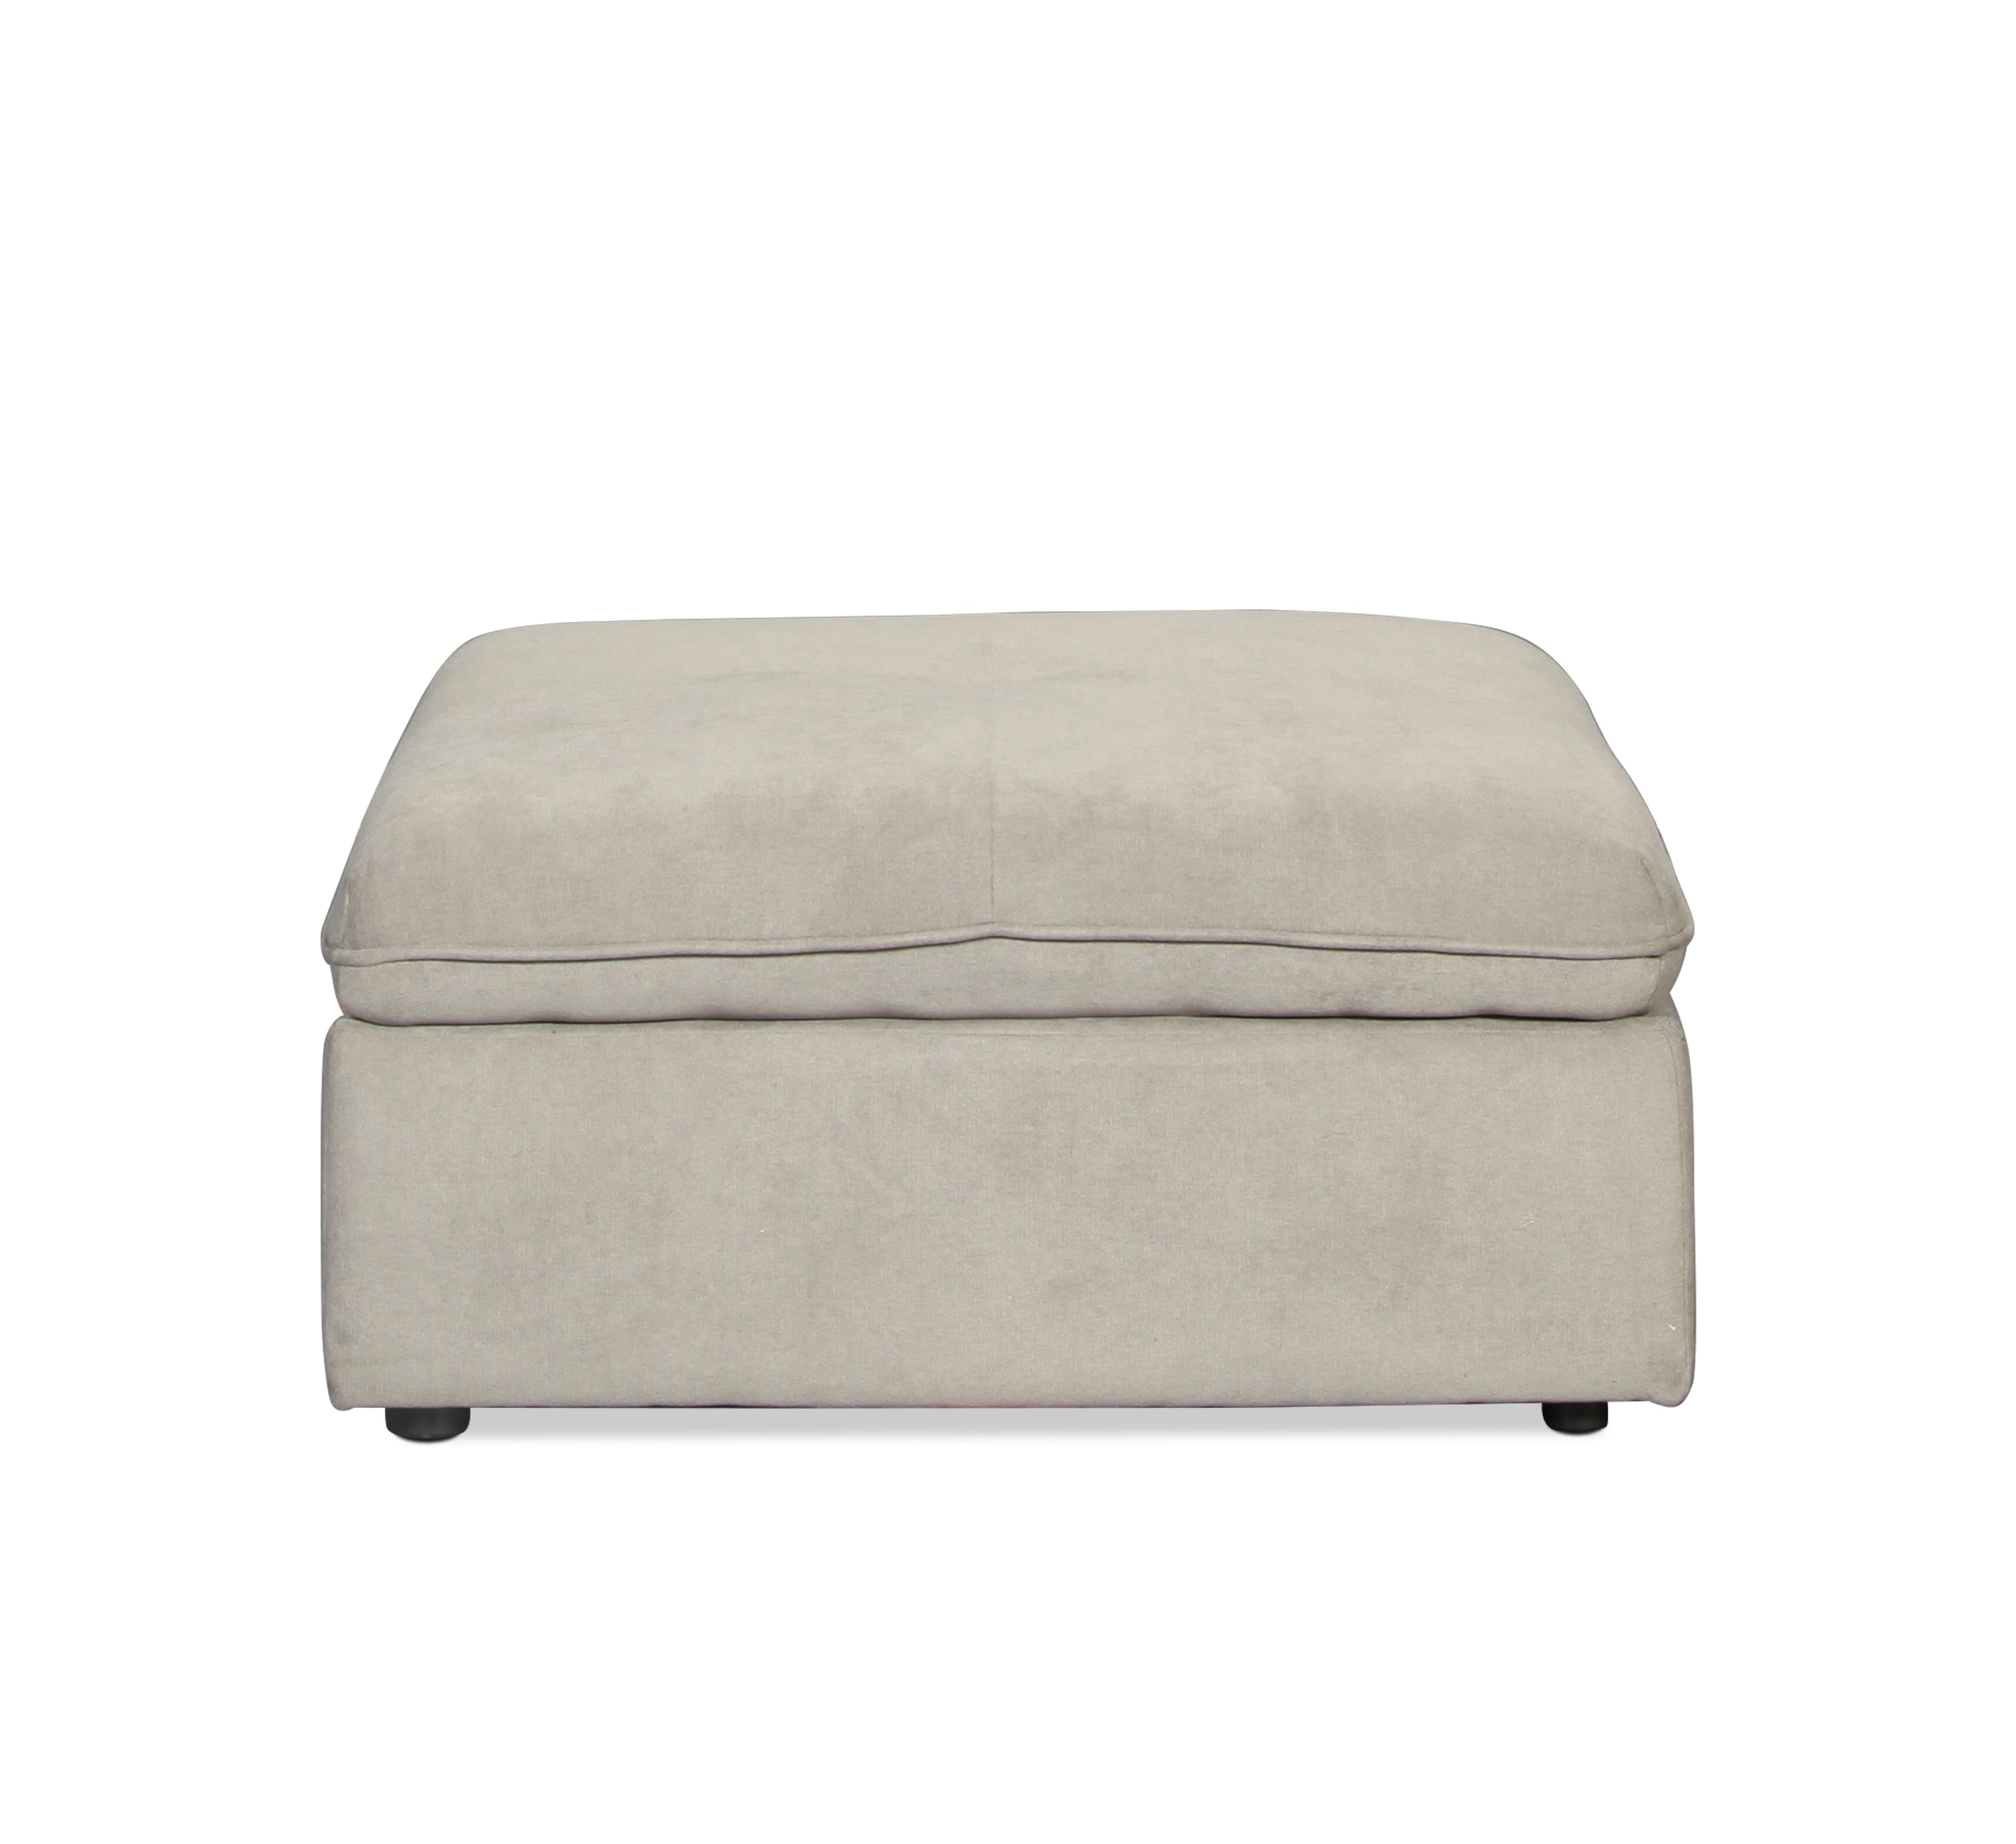 Living Room Furniture - Dalton Ottoman - Taormina